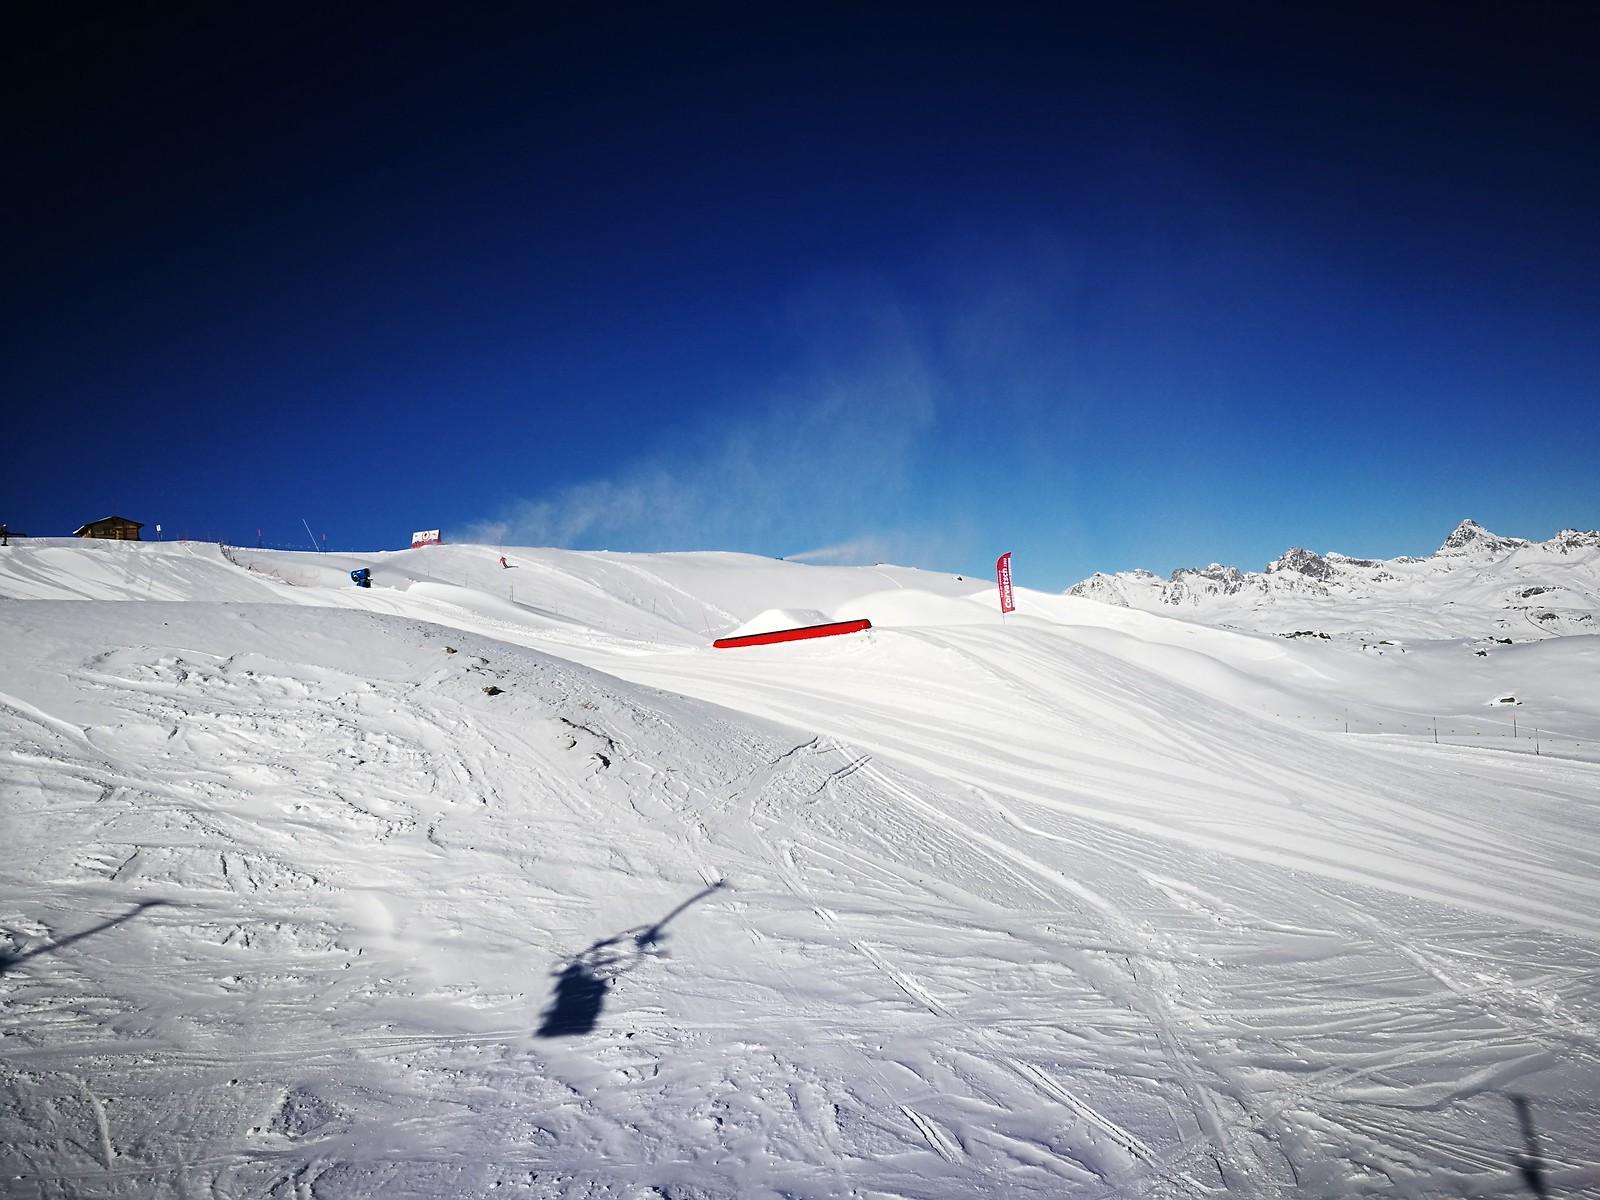 Blue skies over the ski park